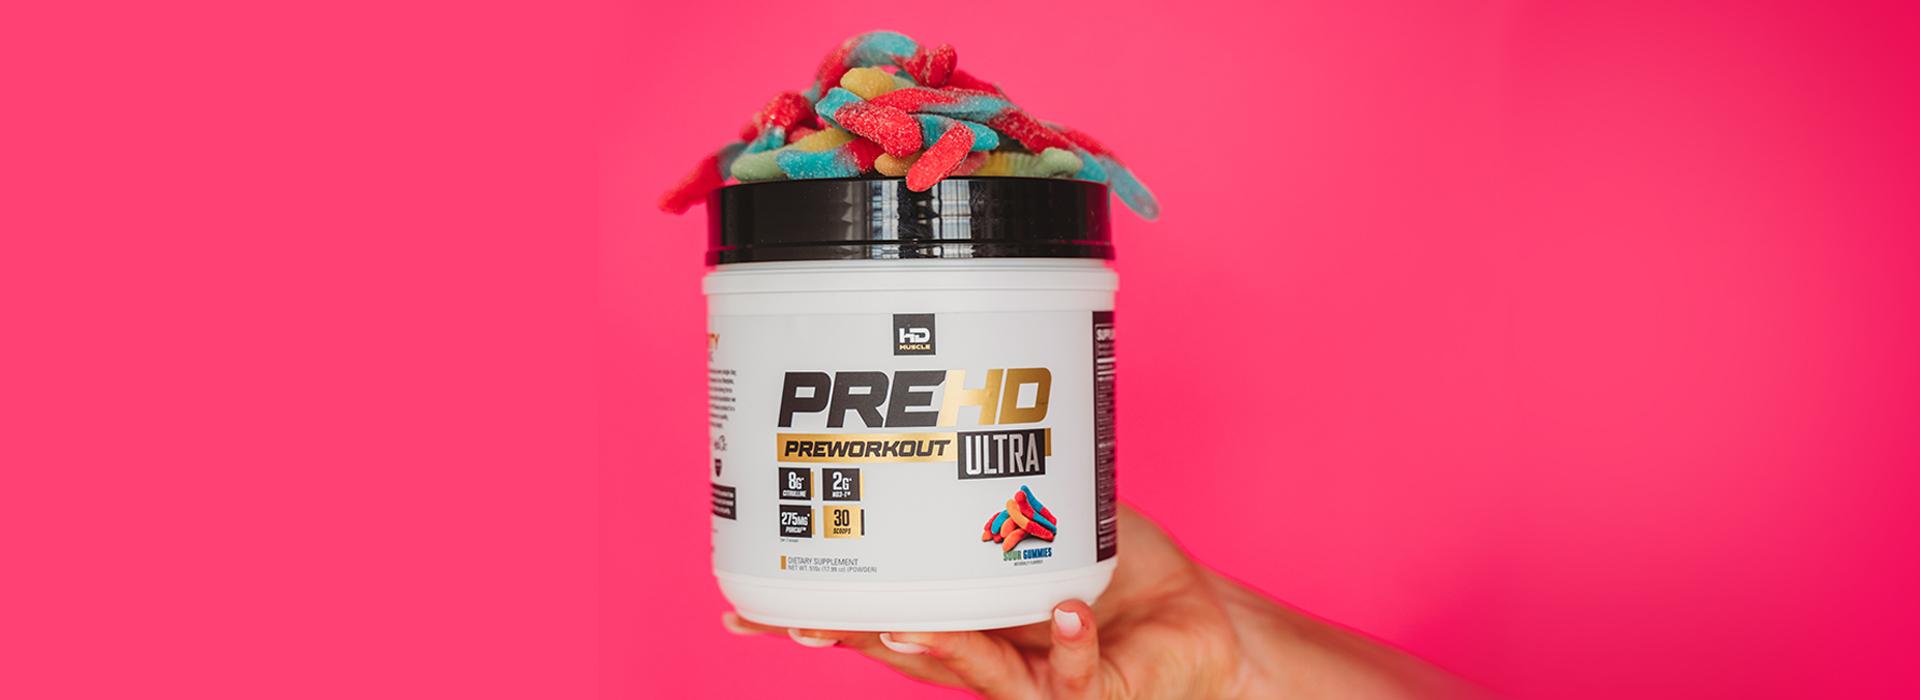 PreHD Ultra